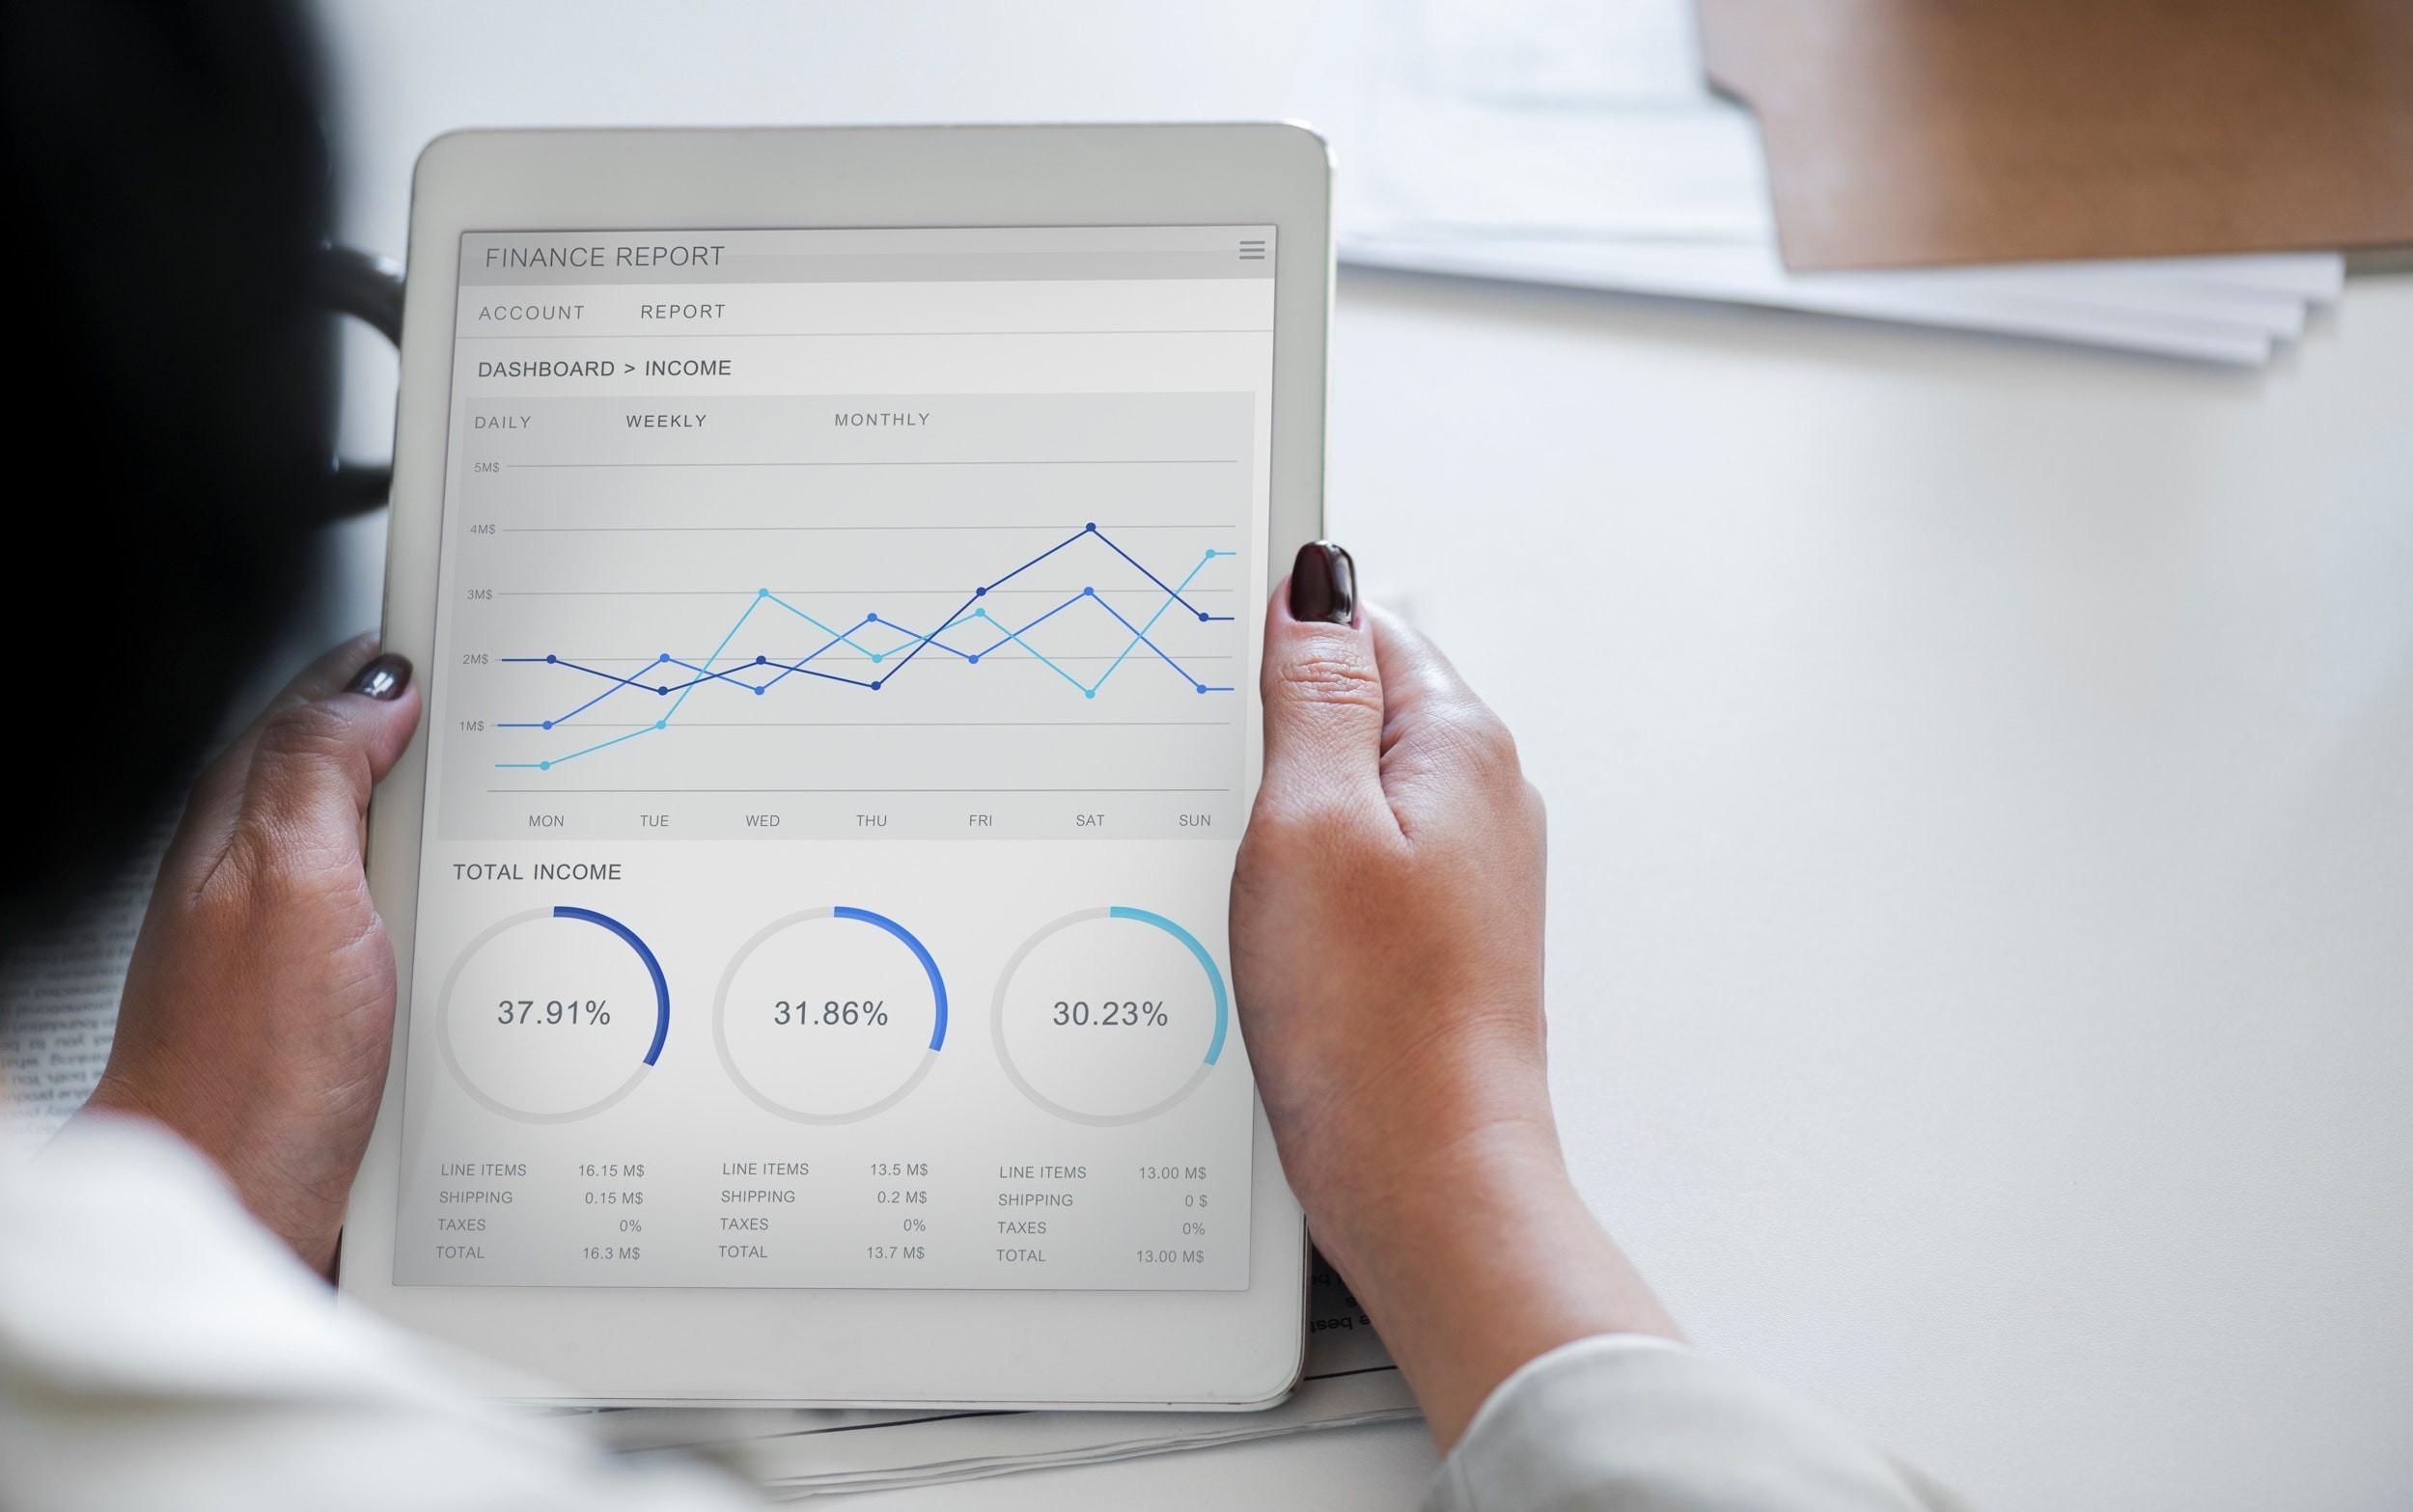 investimento, fintechs, gráficos, rentabilidade, lucro (Foto: Pexels)